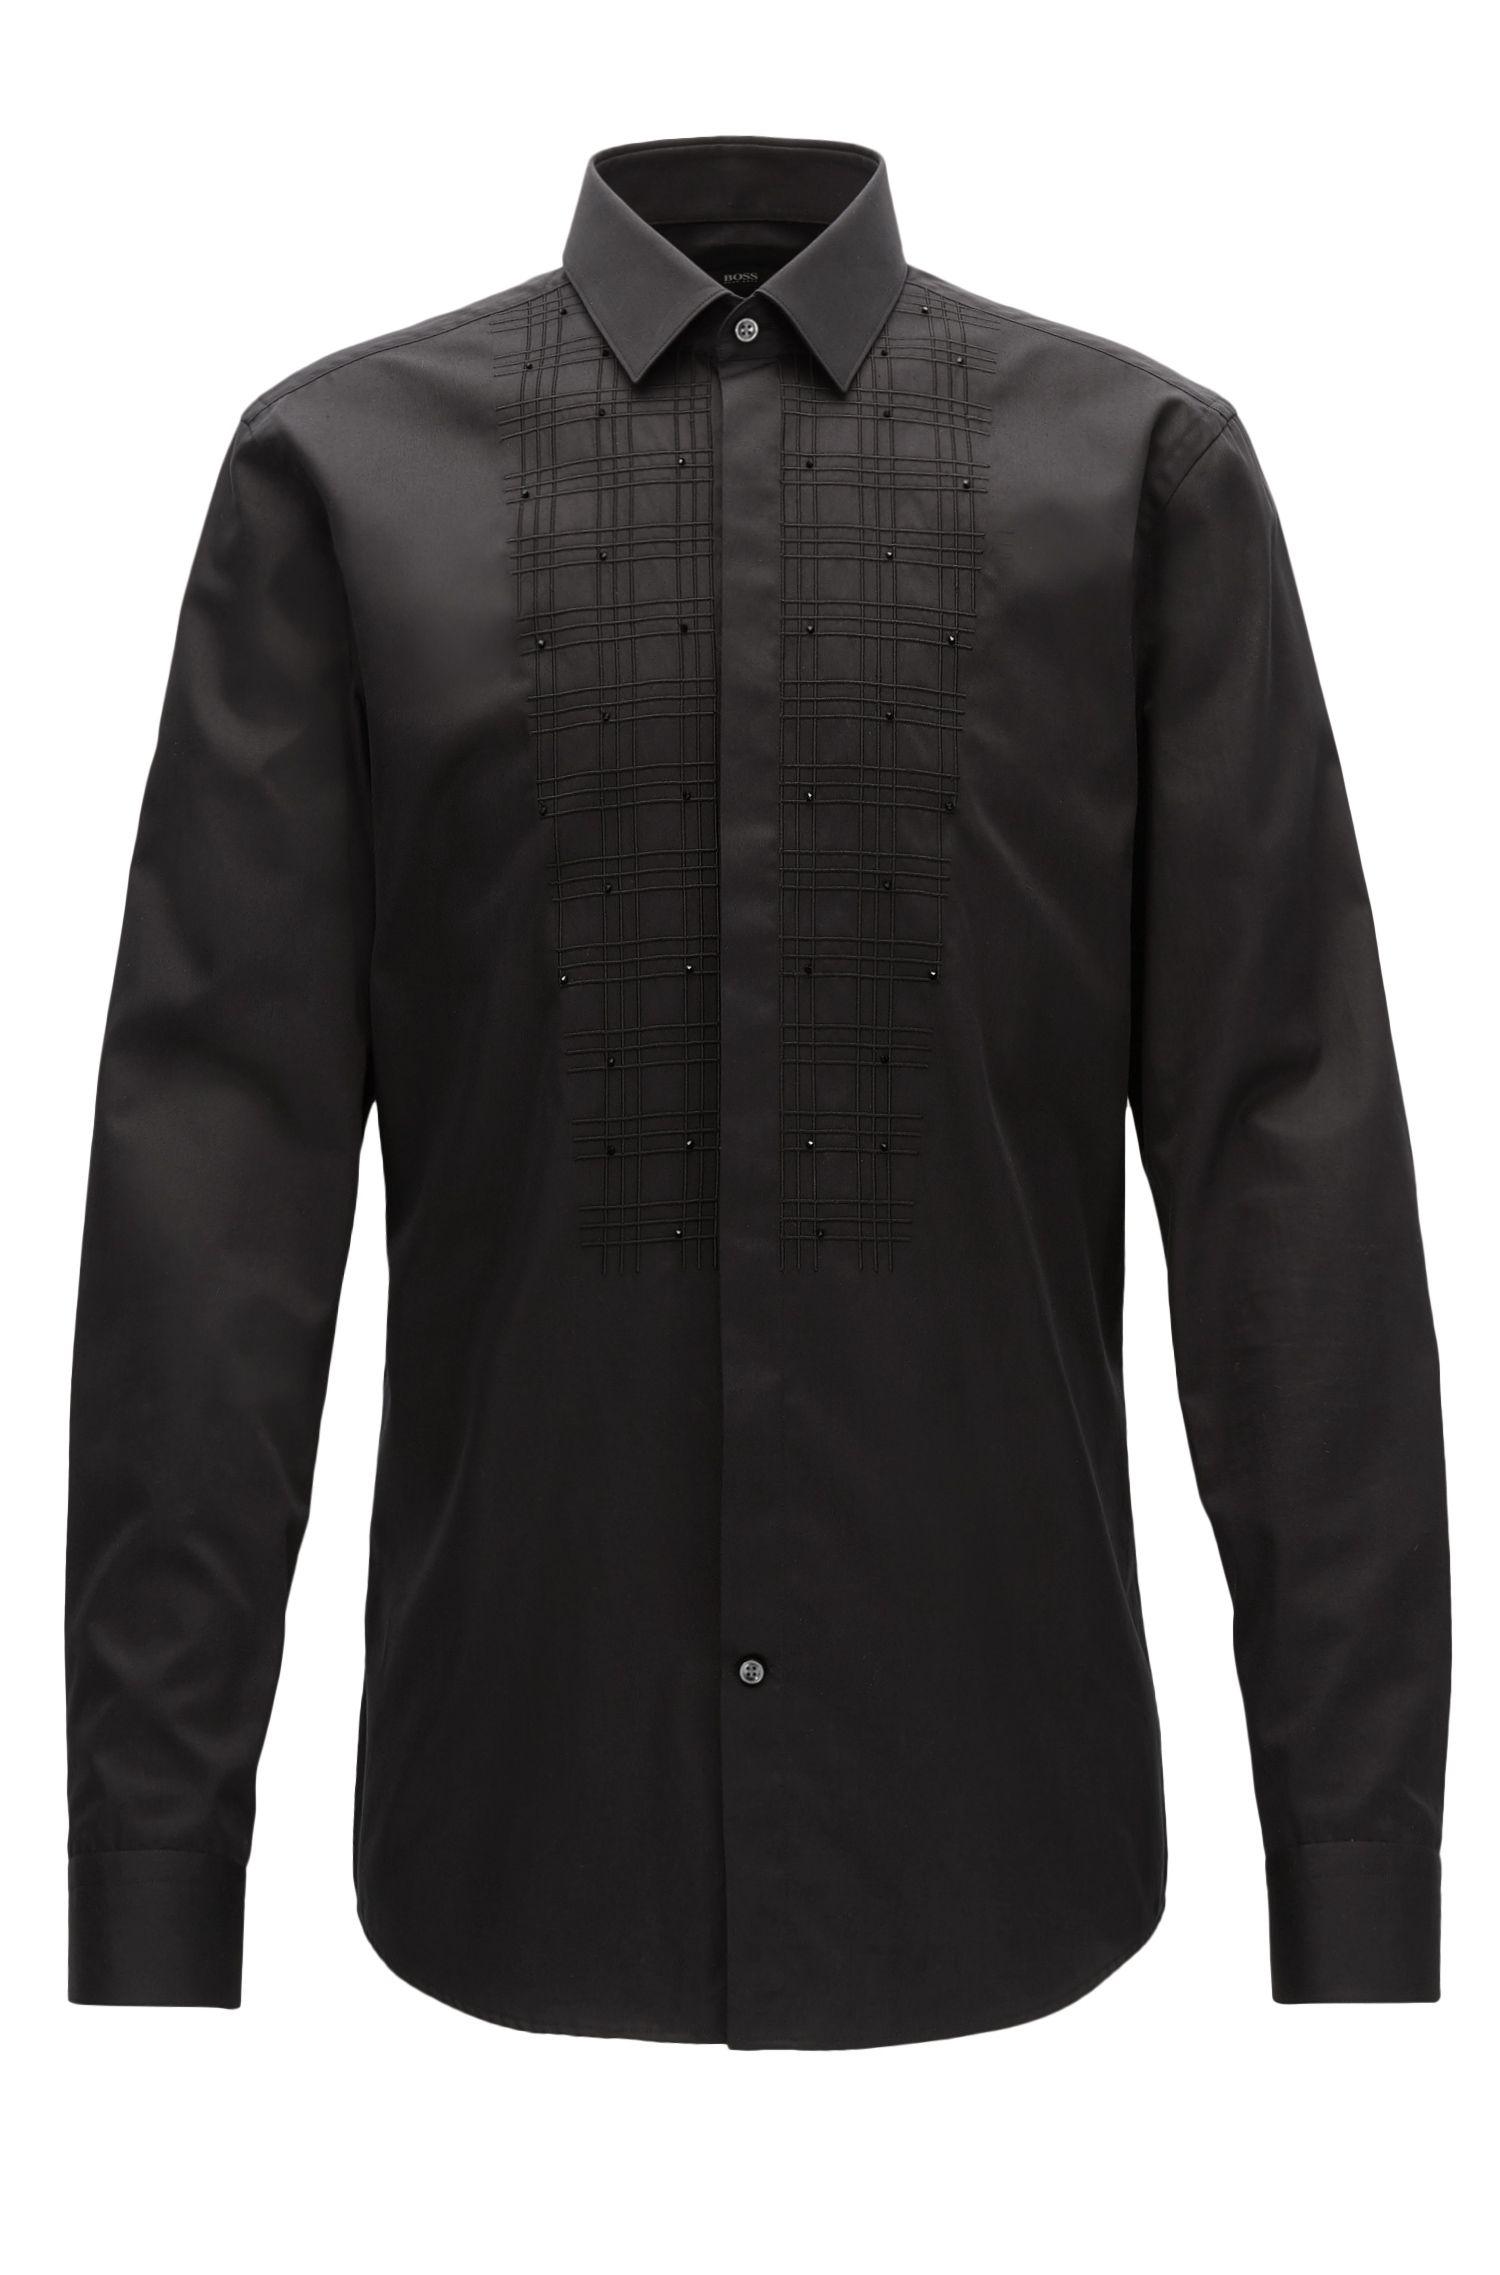 Embellished Tuxedo Bib Dress Shirt, | Jeffry